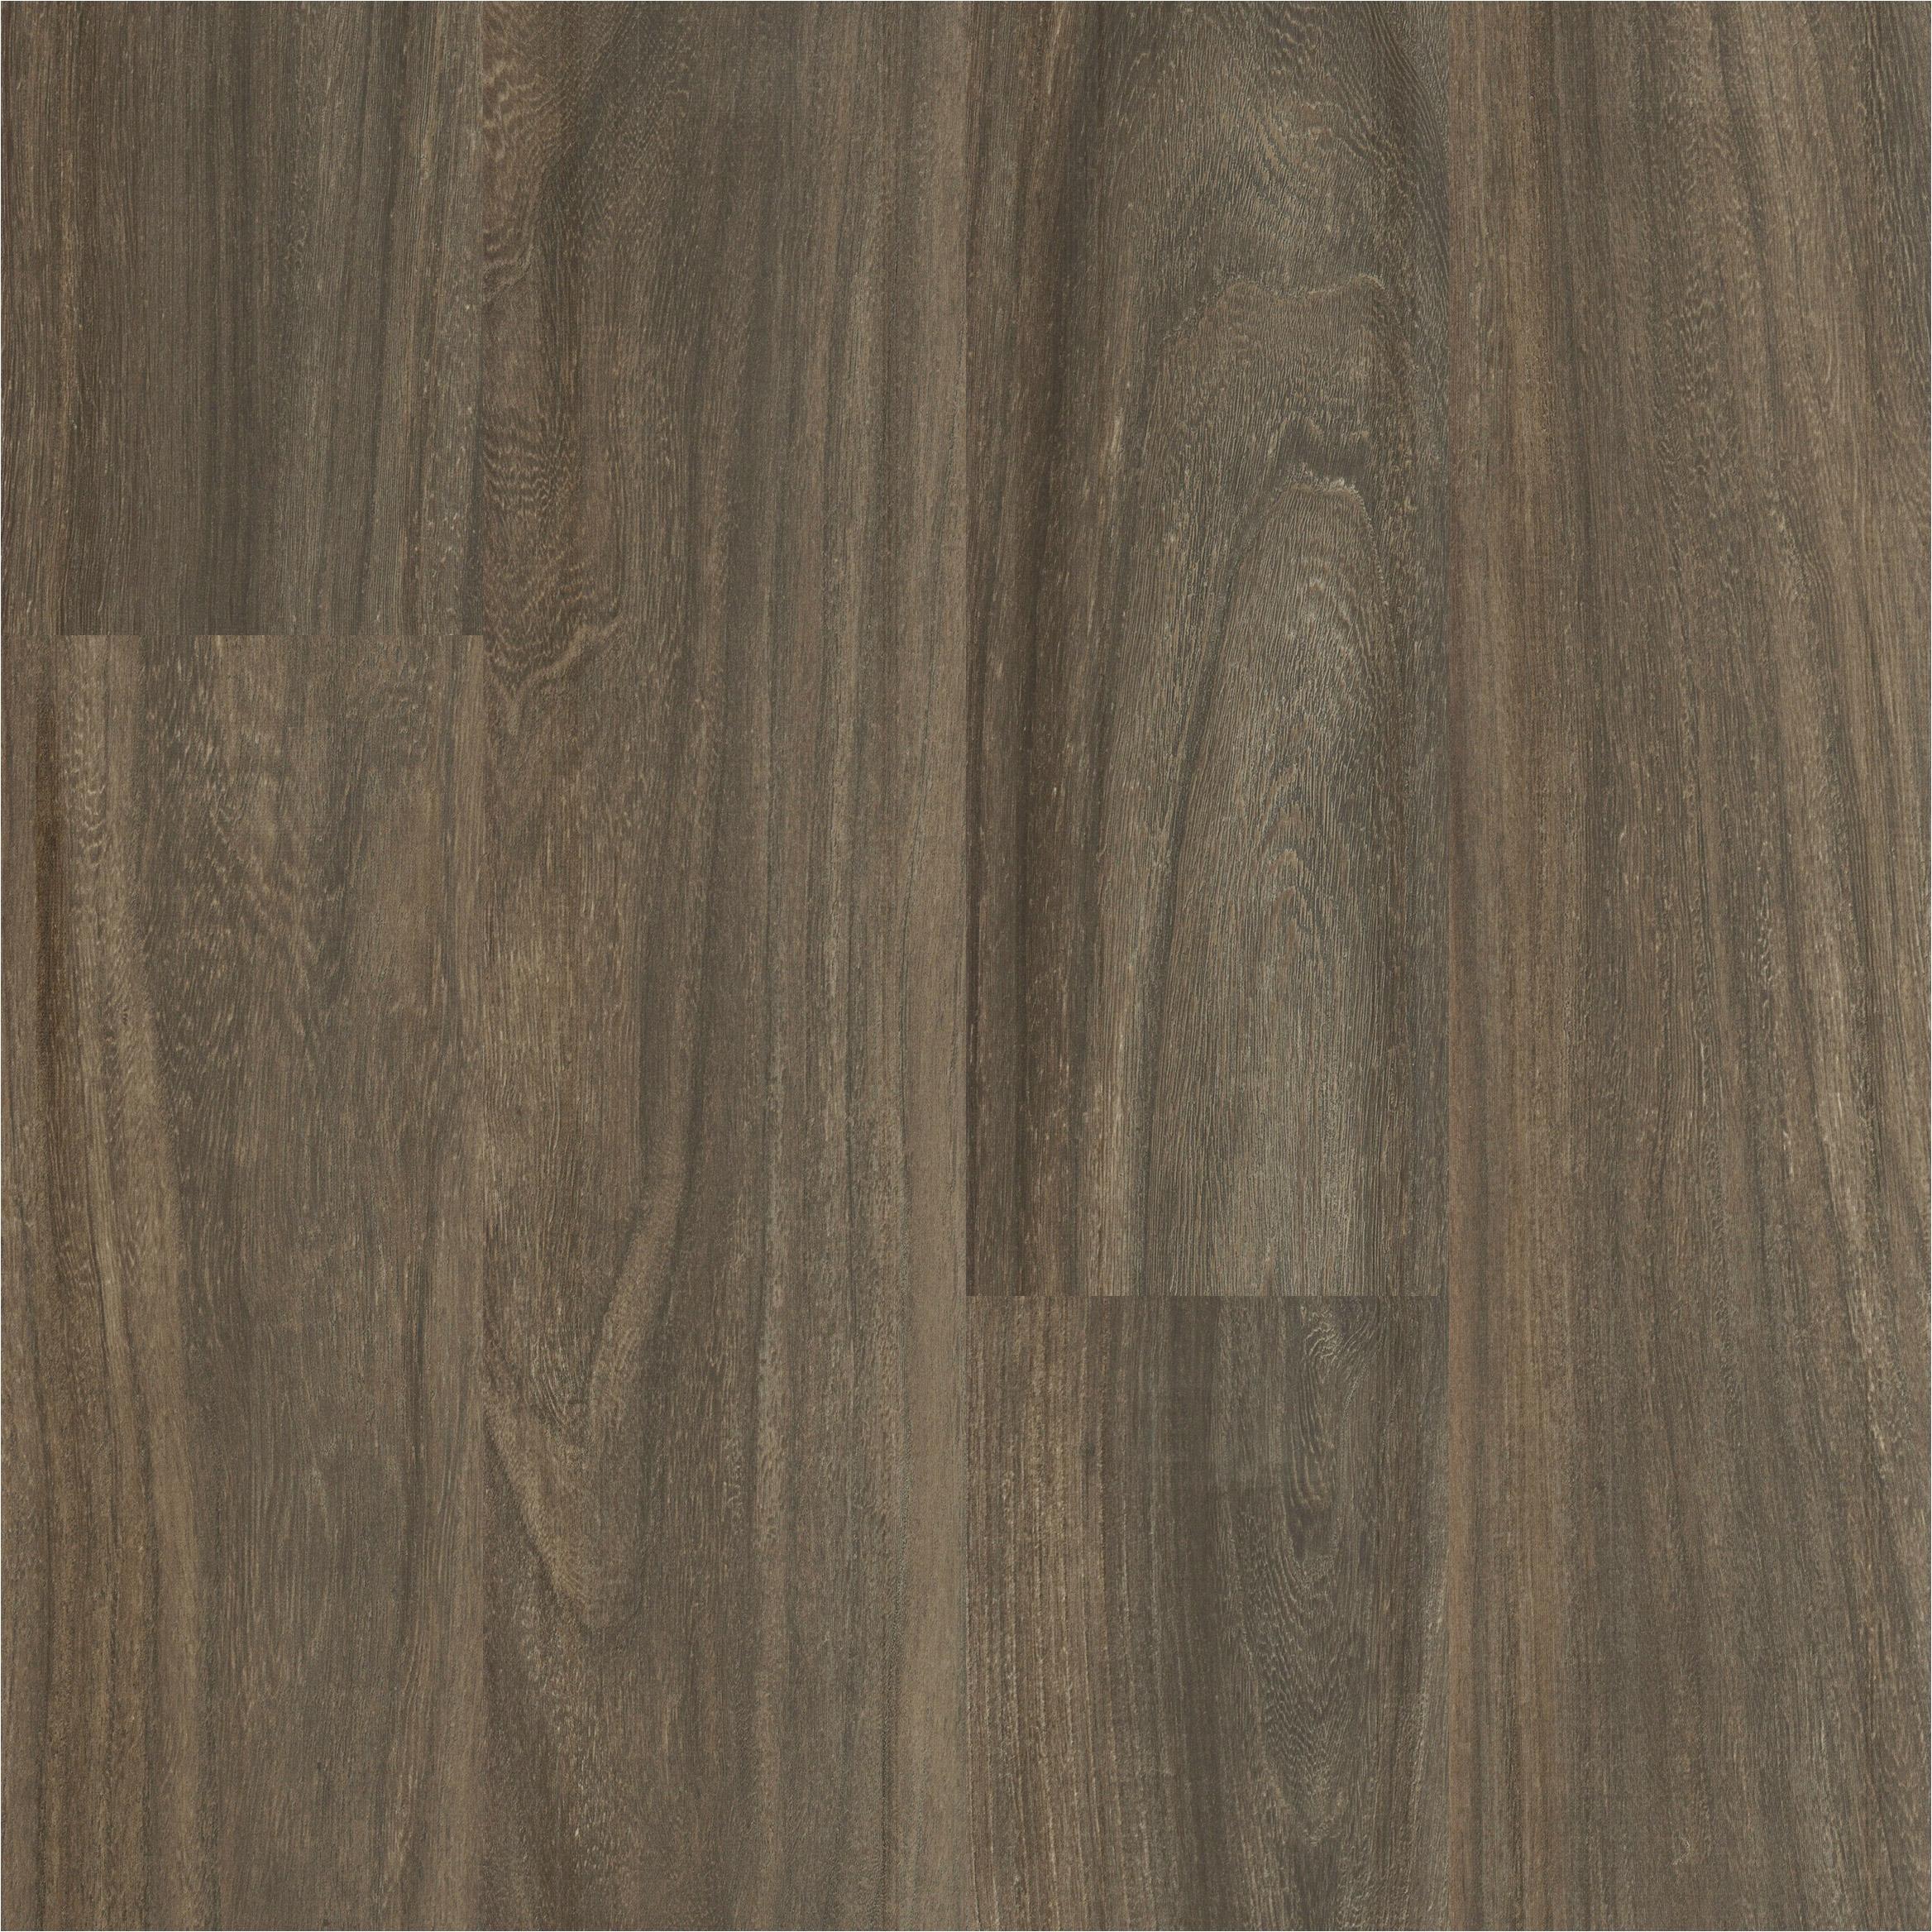 more views ivc liberty plank big leaf maple 6 wide luxury vinyl plank flooring